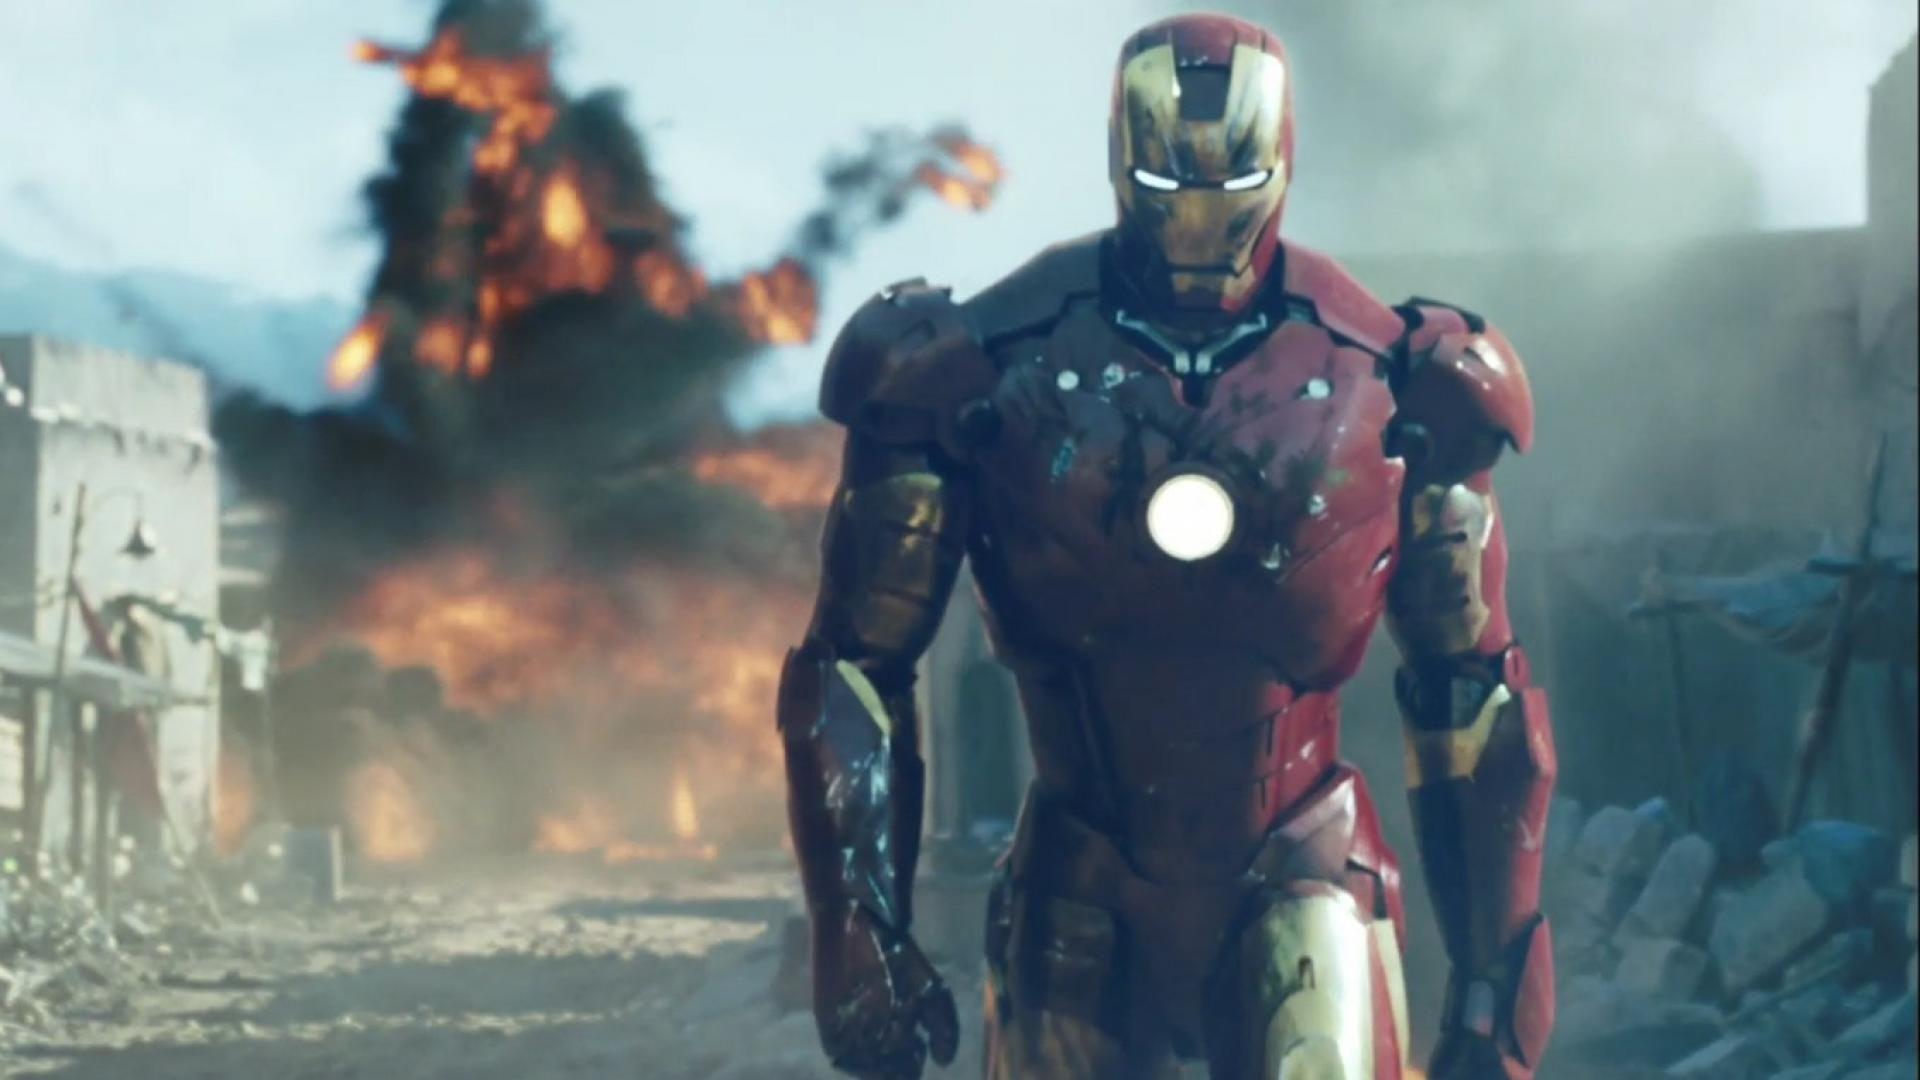 Iron Man Wallpaper 34447: HD Wallpapers Iron Man Wallpaper 2560×1440 Iron Man Hd